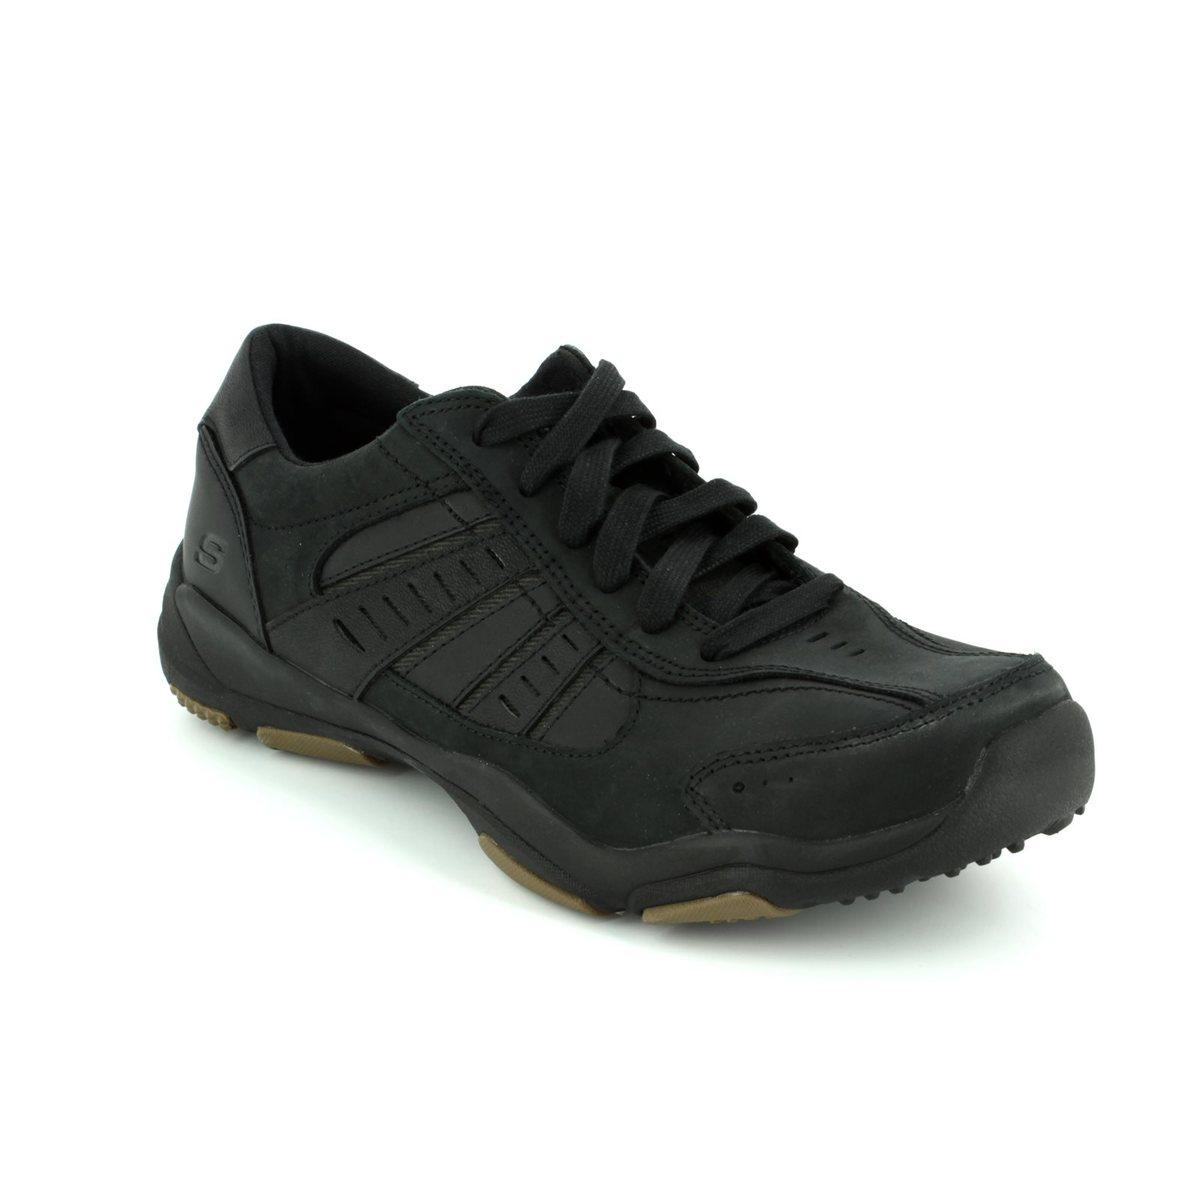 08972e66 Skechers Casual Shoes - Black - 64833 LARSON NERICK